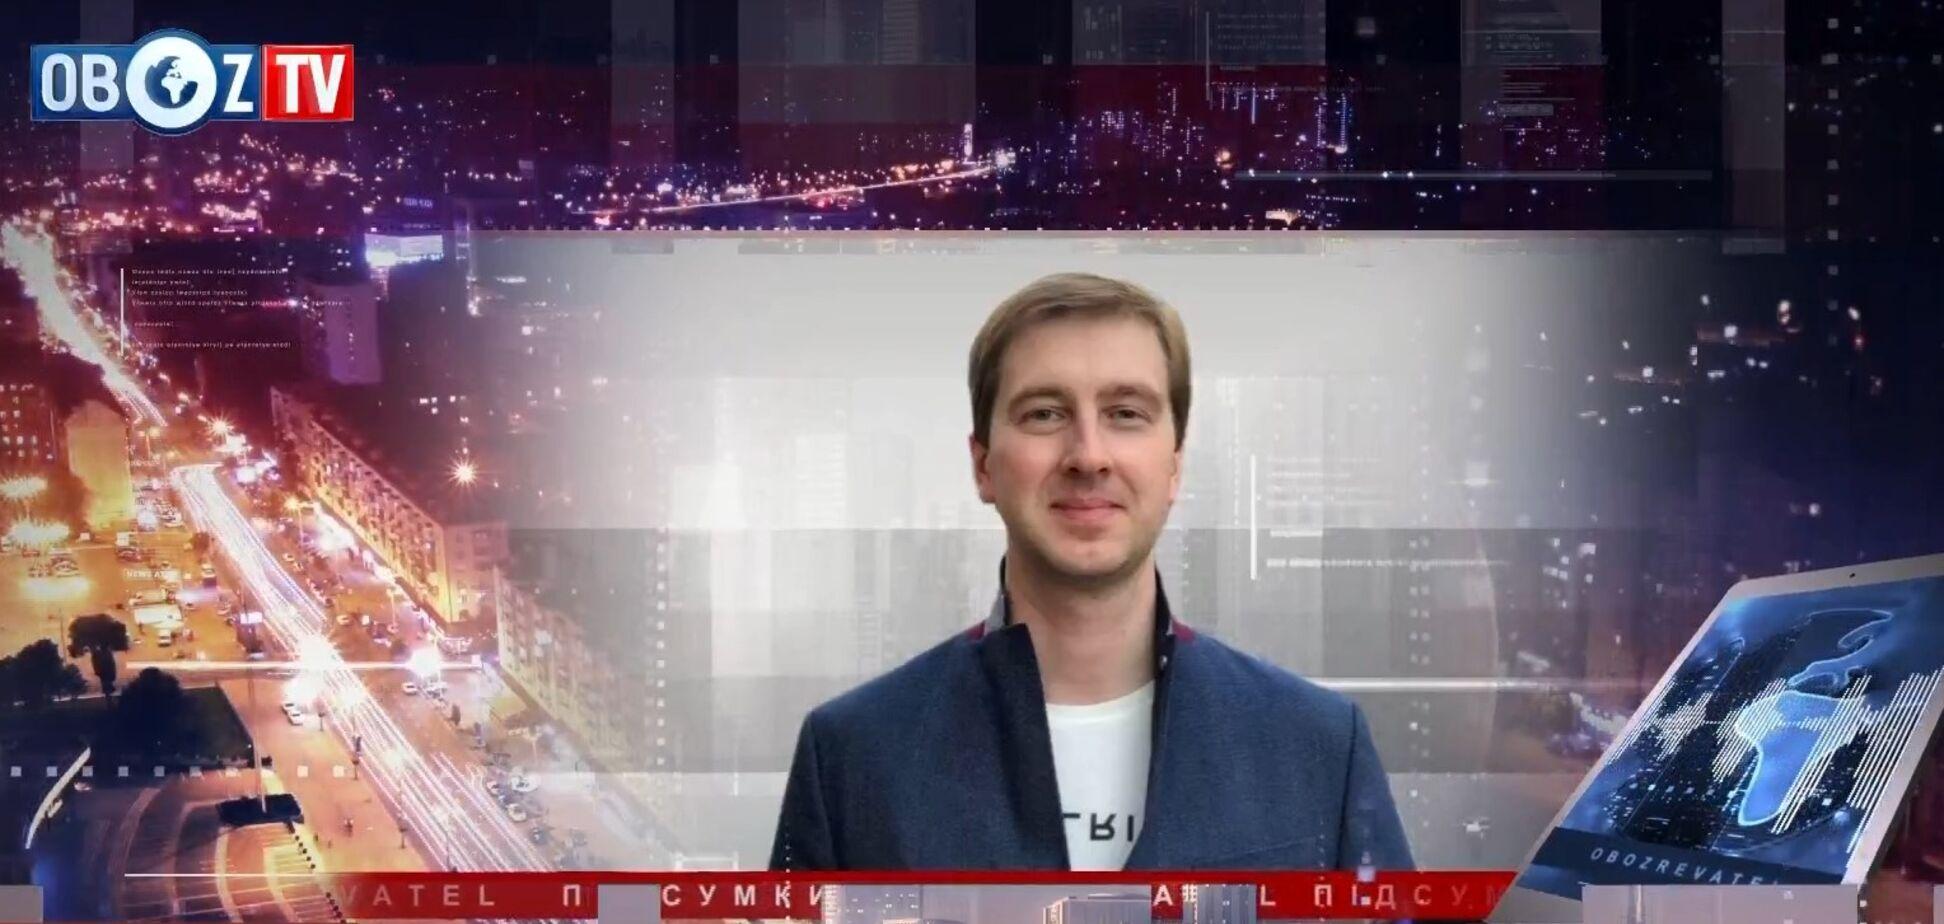 Фейки о коронавирусе работают против Гончарука: экс-сотрудник СБУ